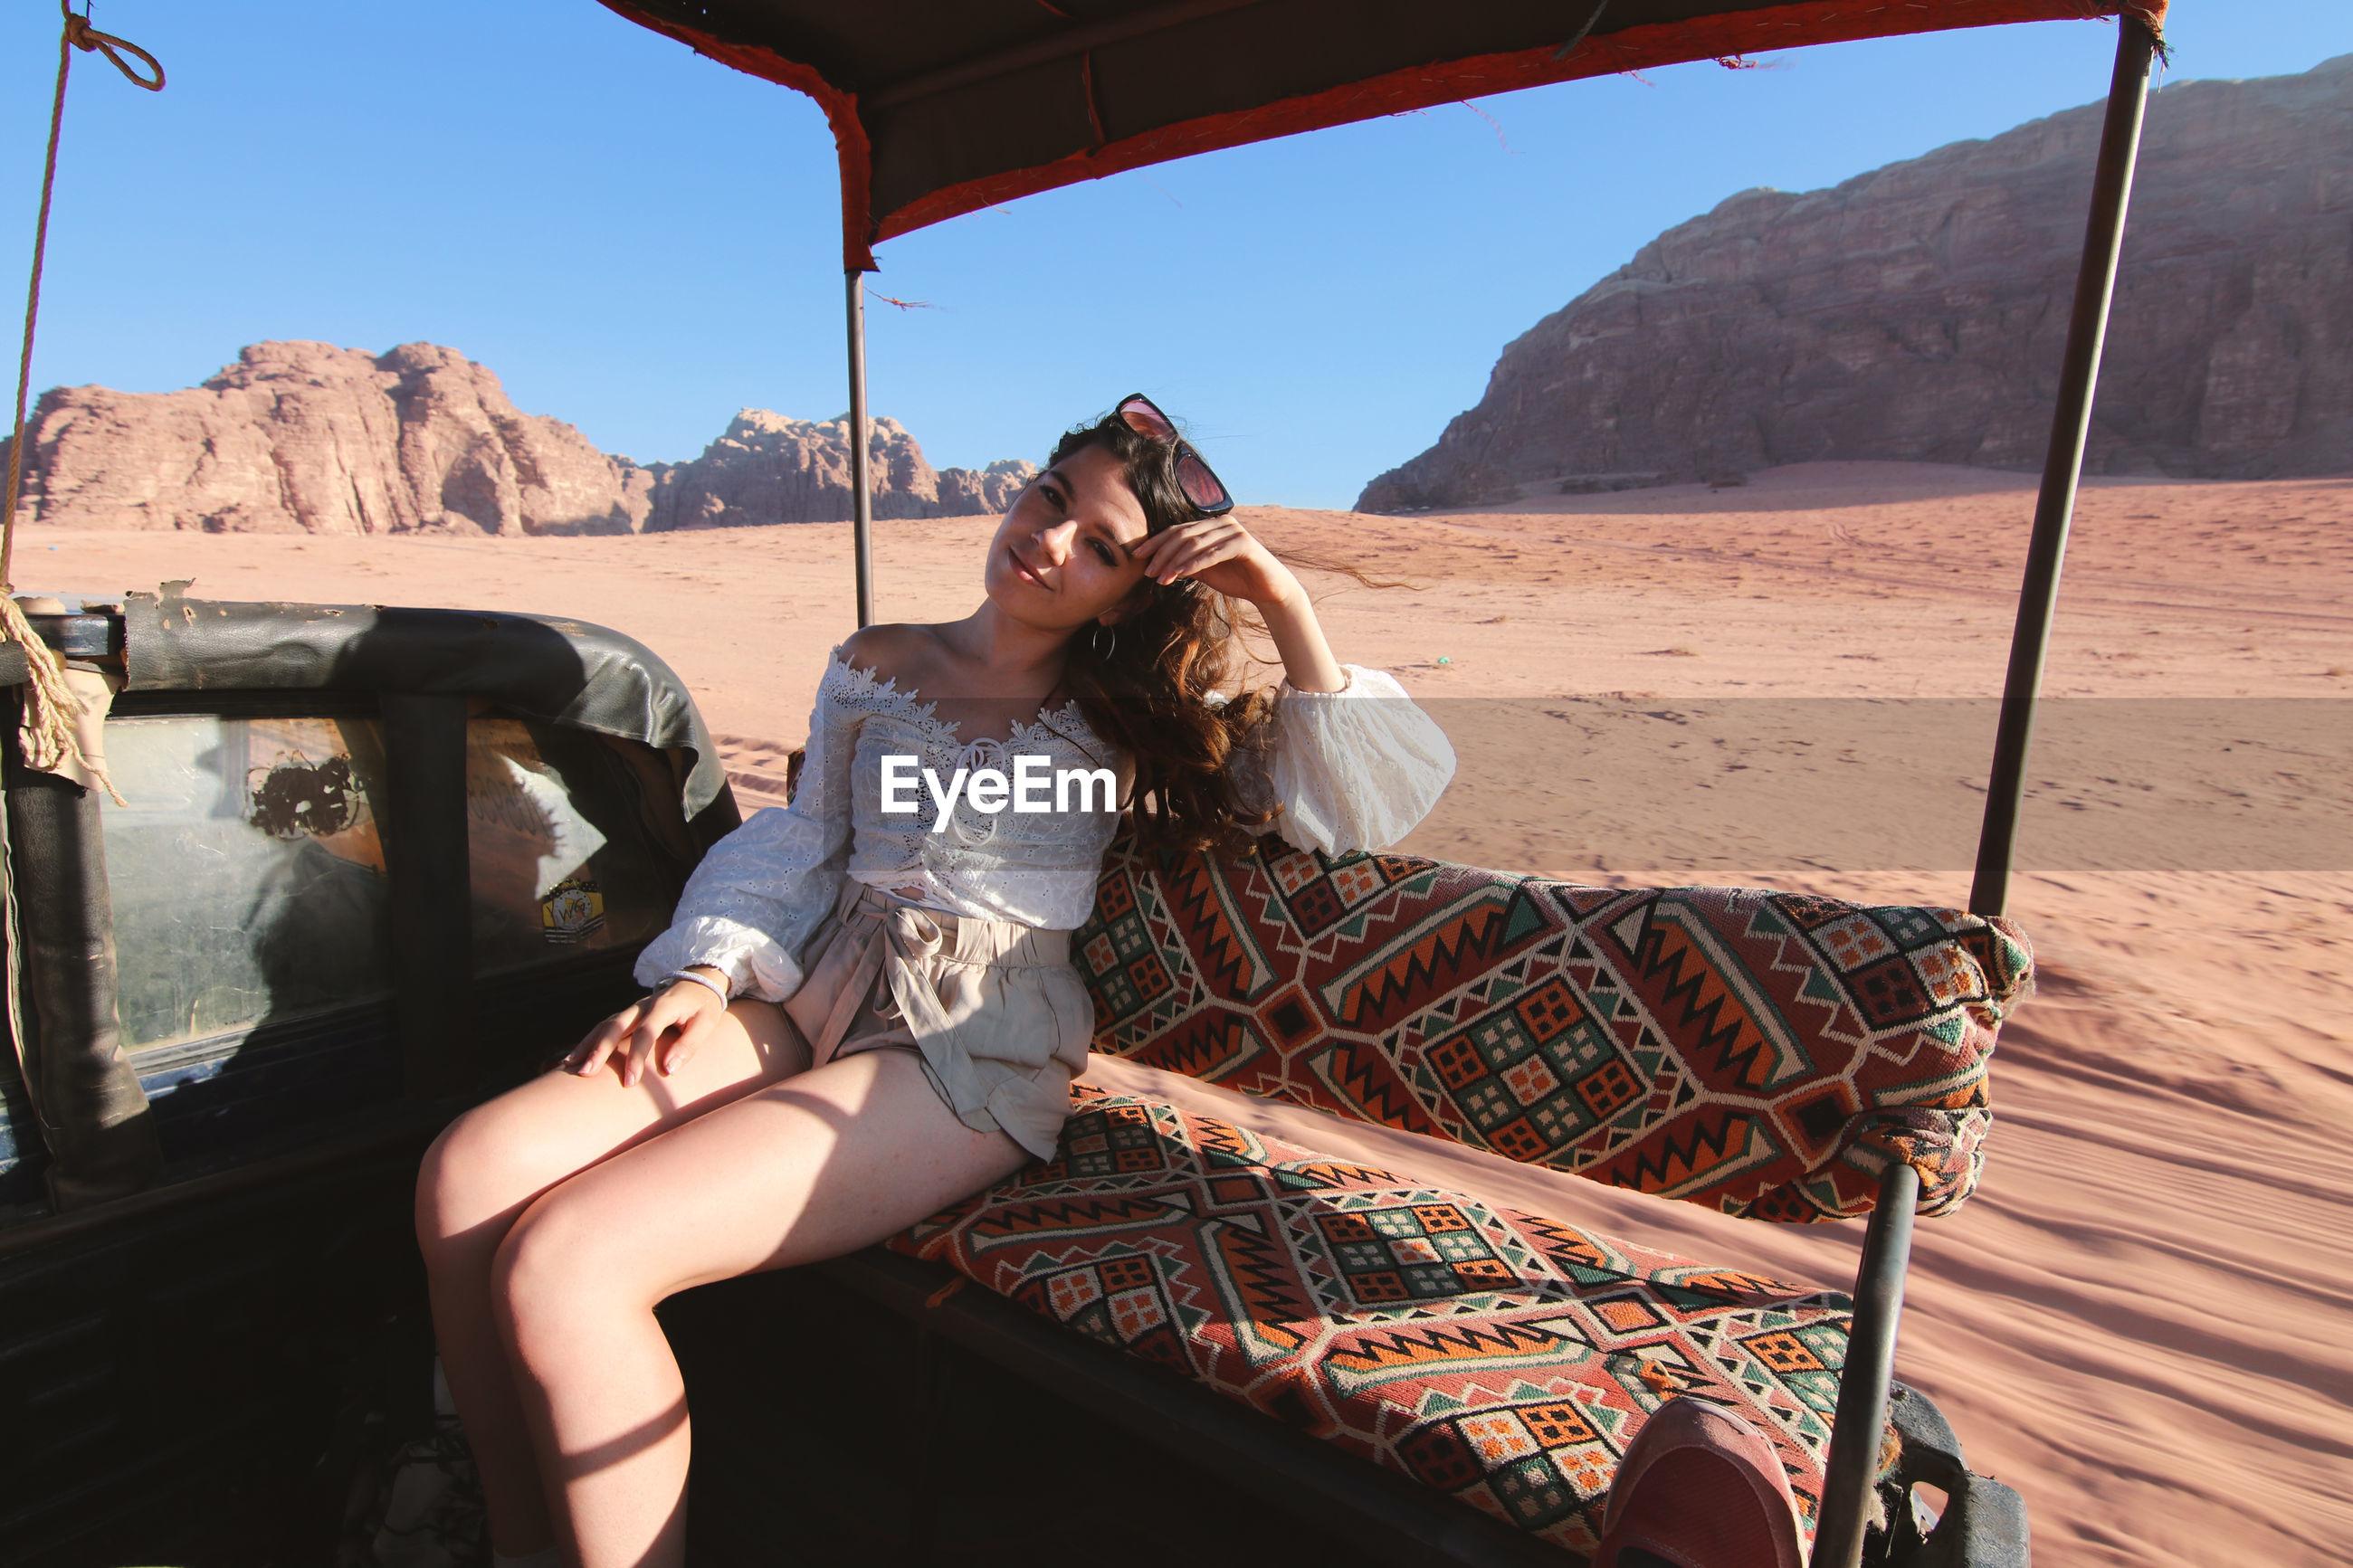 Woman sitting on car riding through desert against mountains